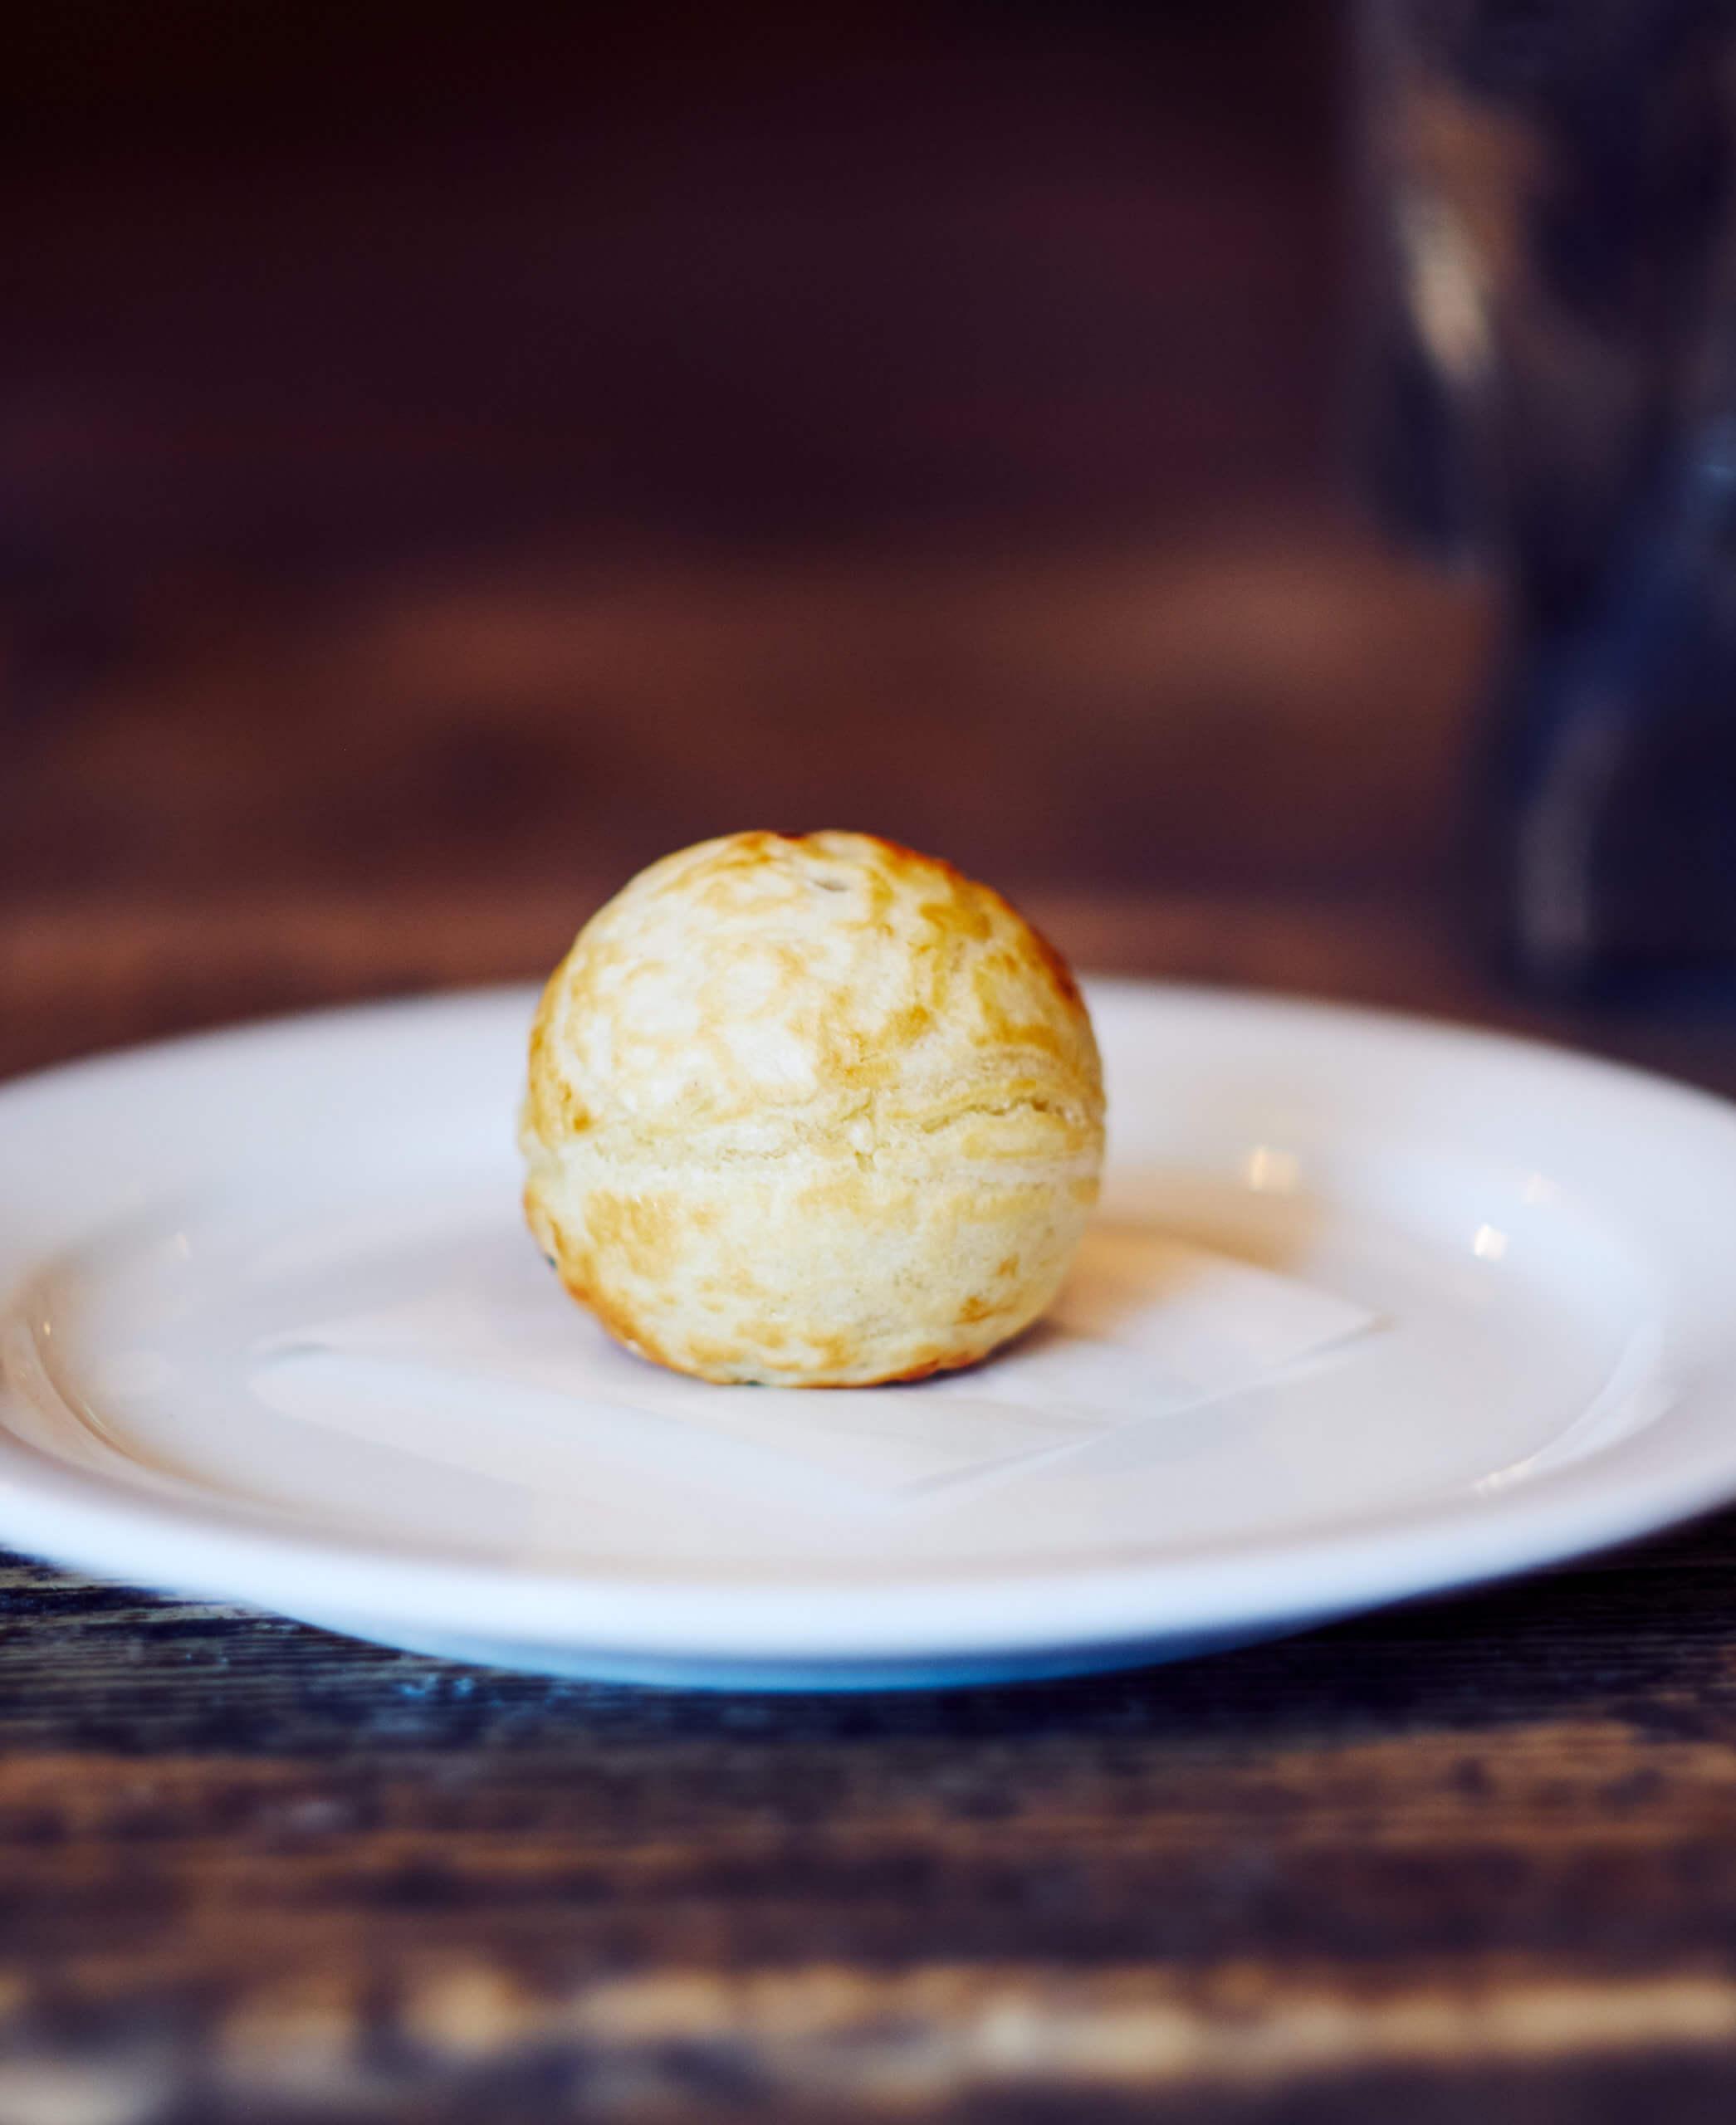 Mullixhiu Chestnut Dish